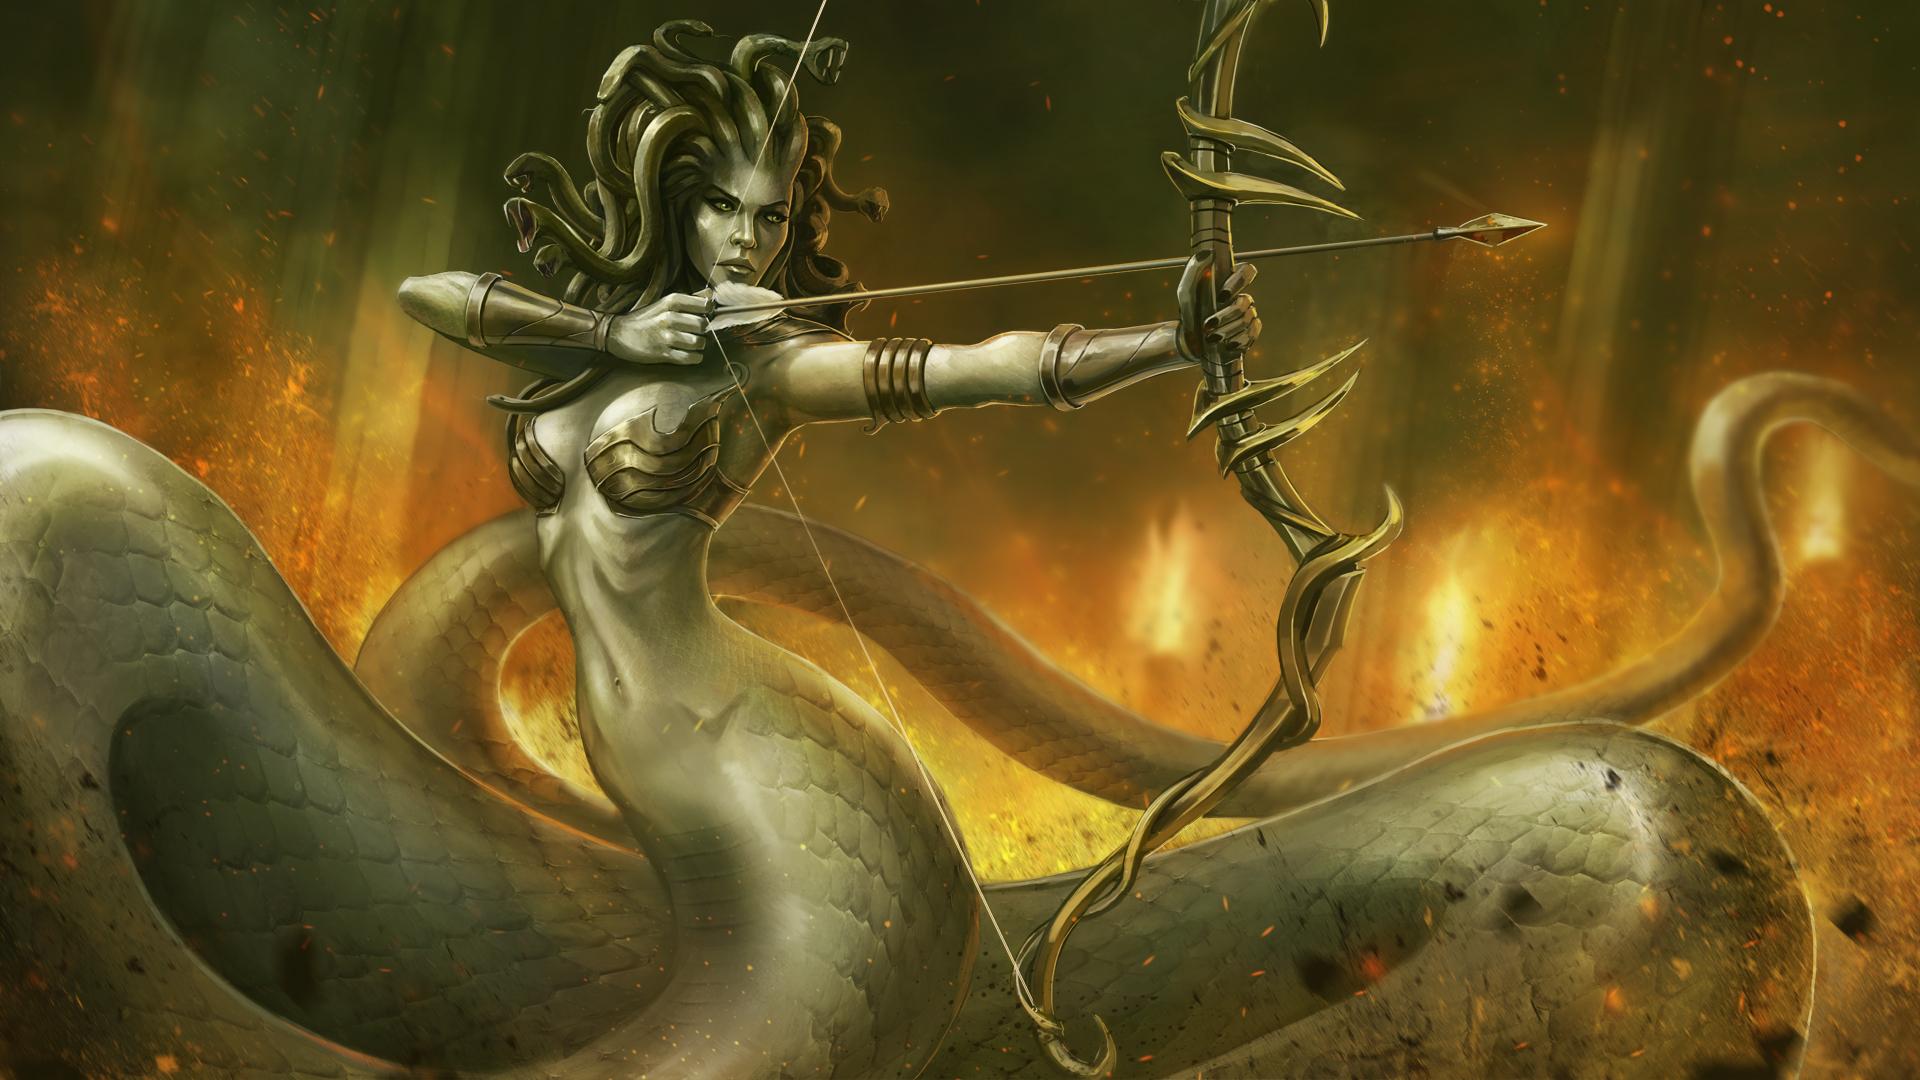 Medusa HD Wallpaper | Background Image